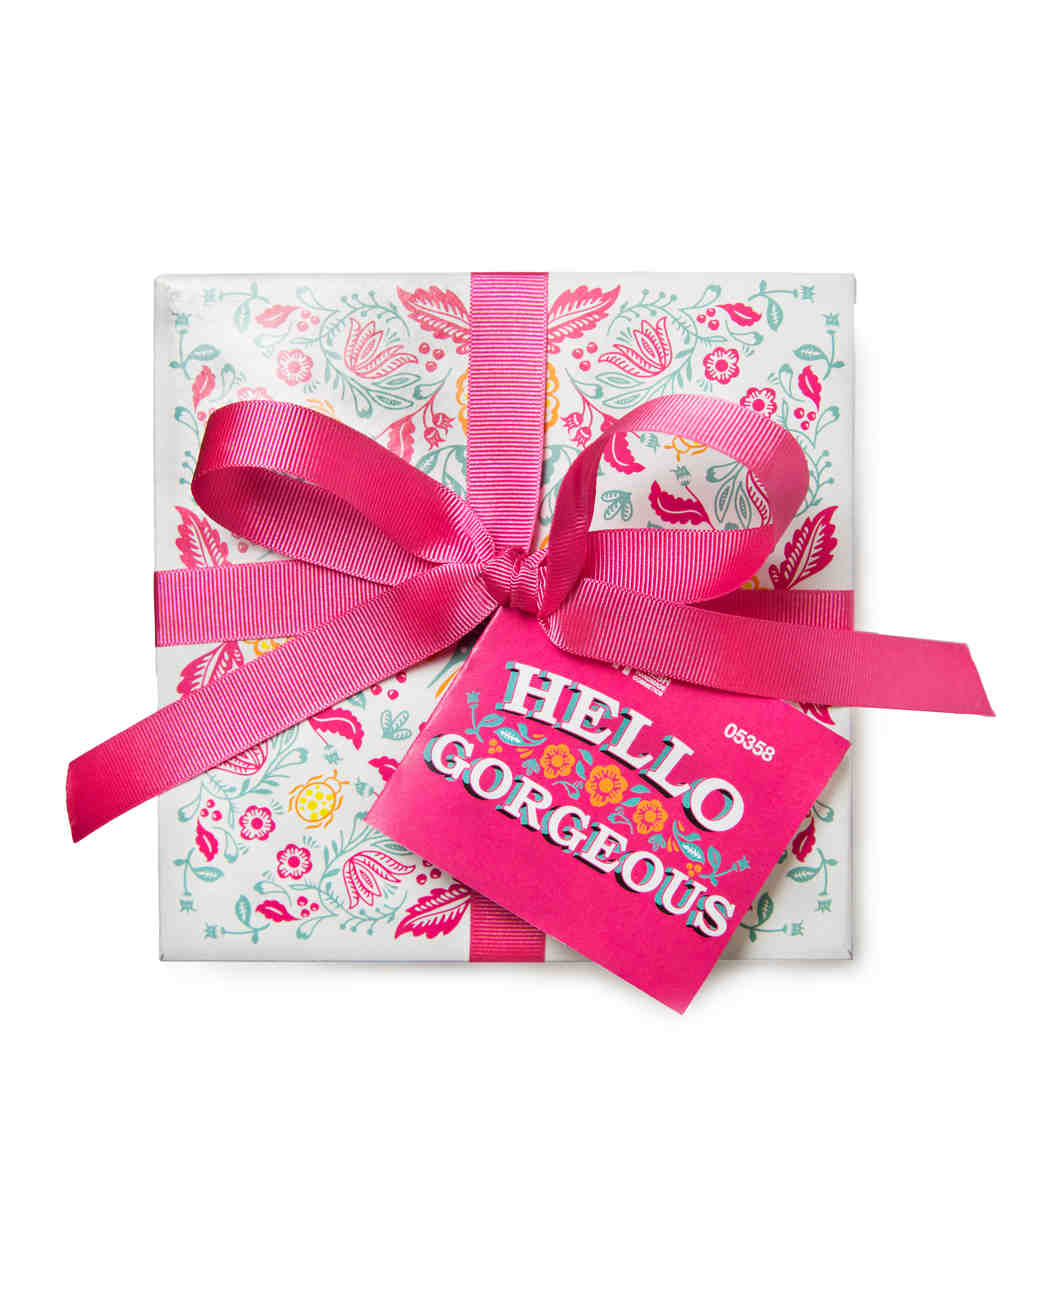 group-bachelorette-party-gift-lush-gift-set-0316.jpg